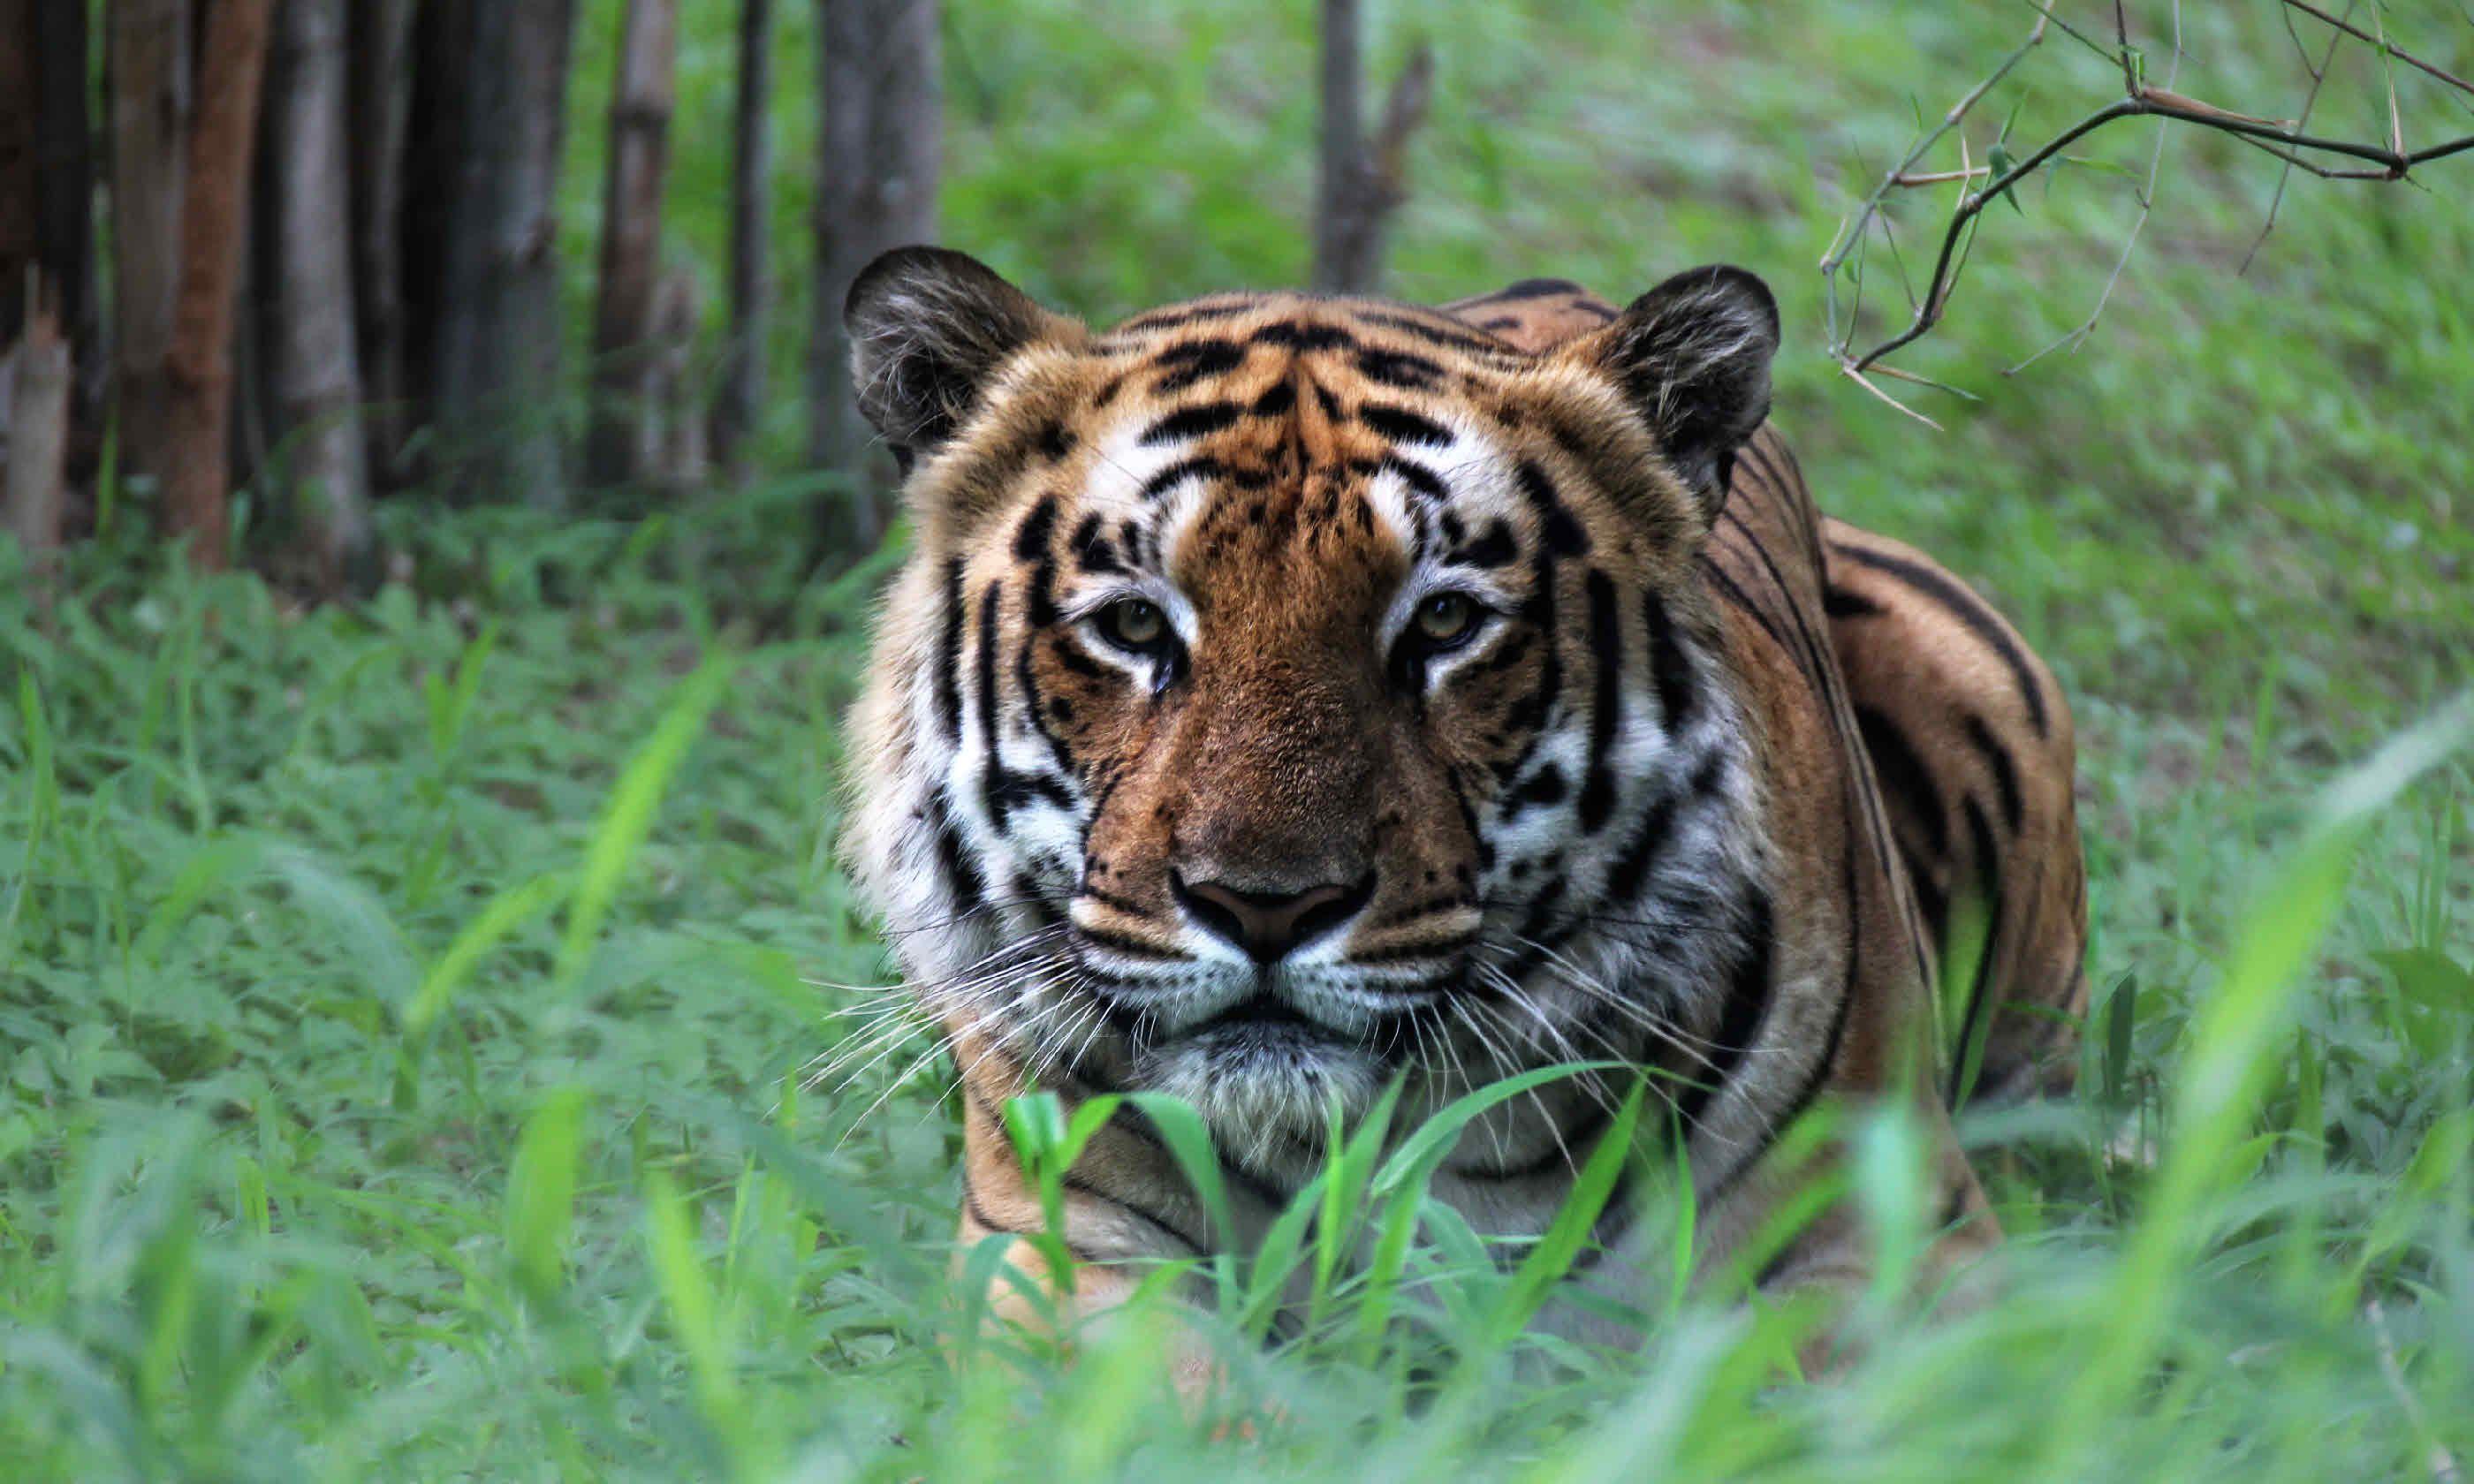 Crouching tiger, India (Shutterstock)